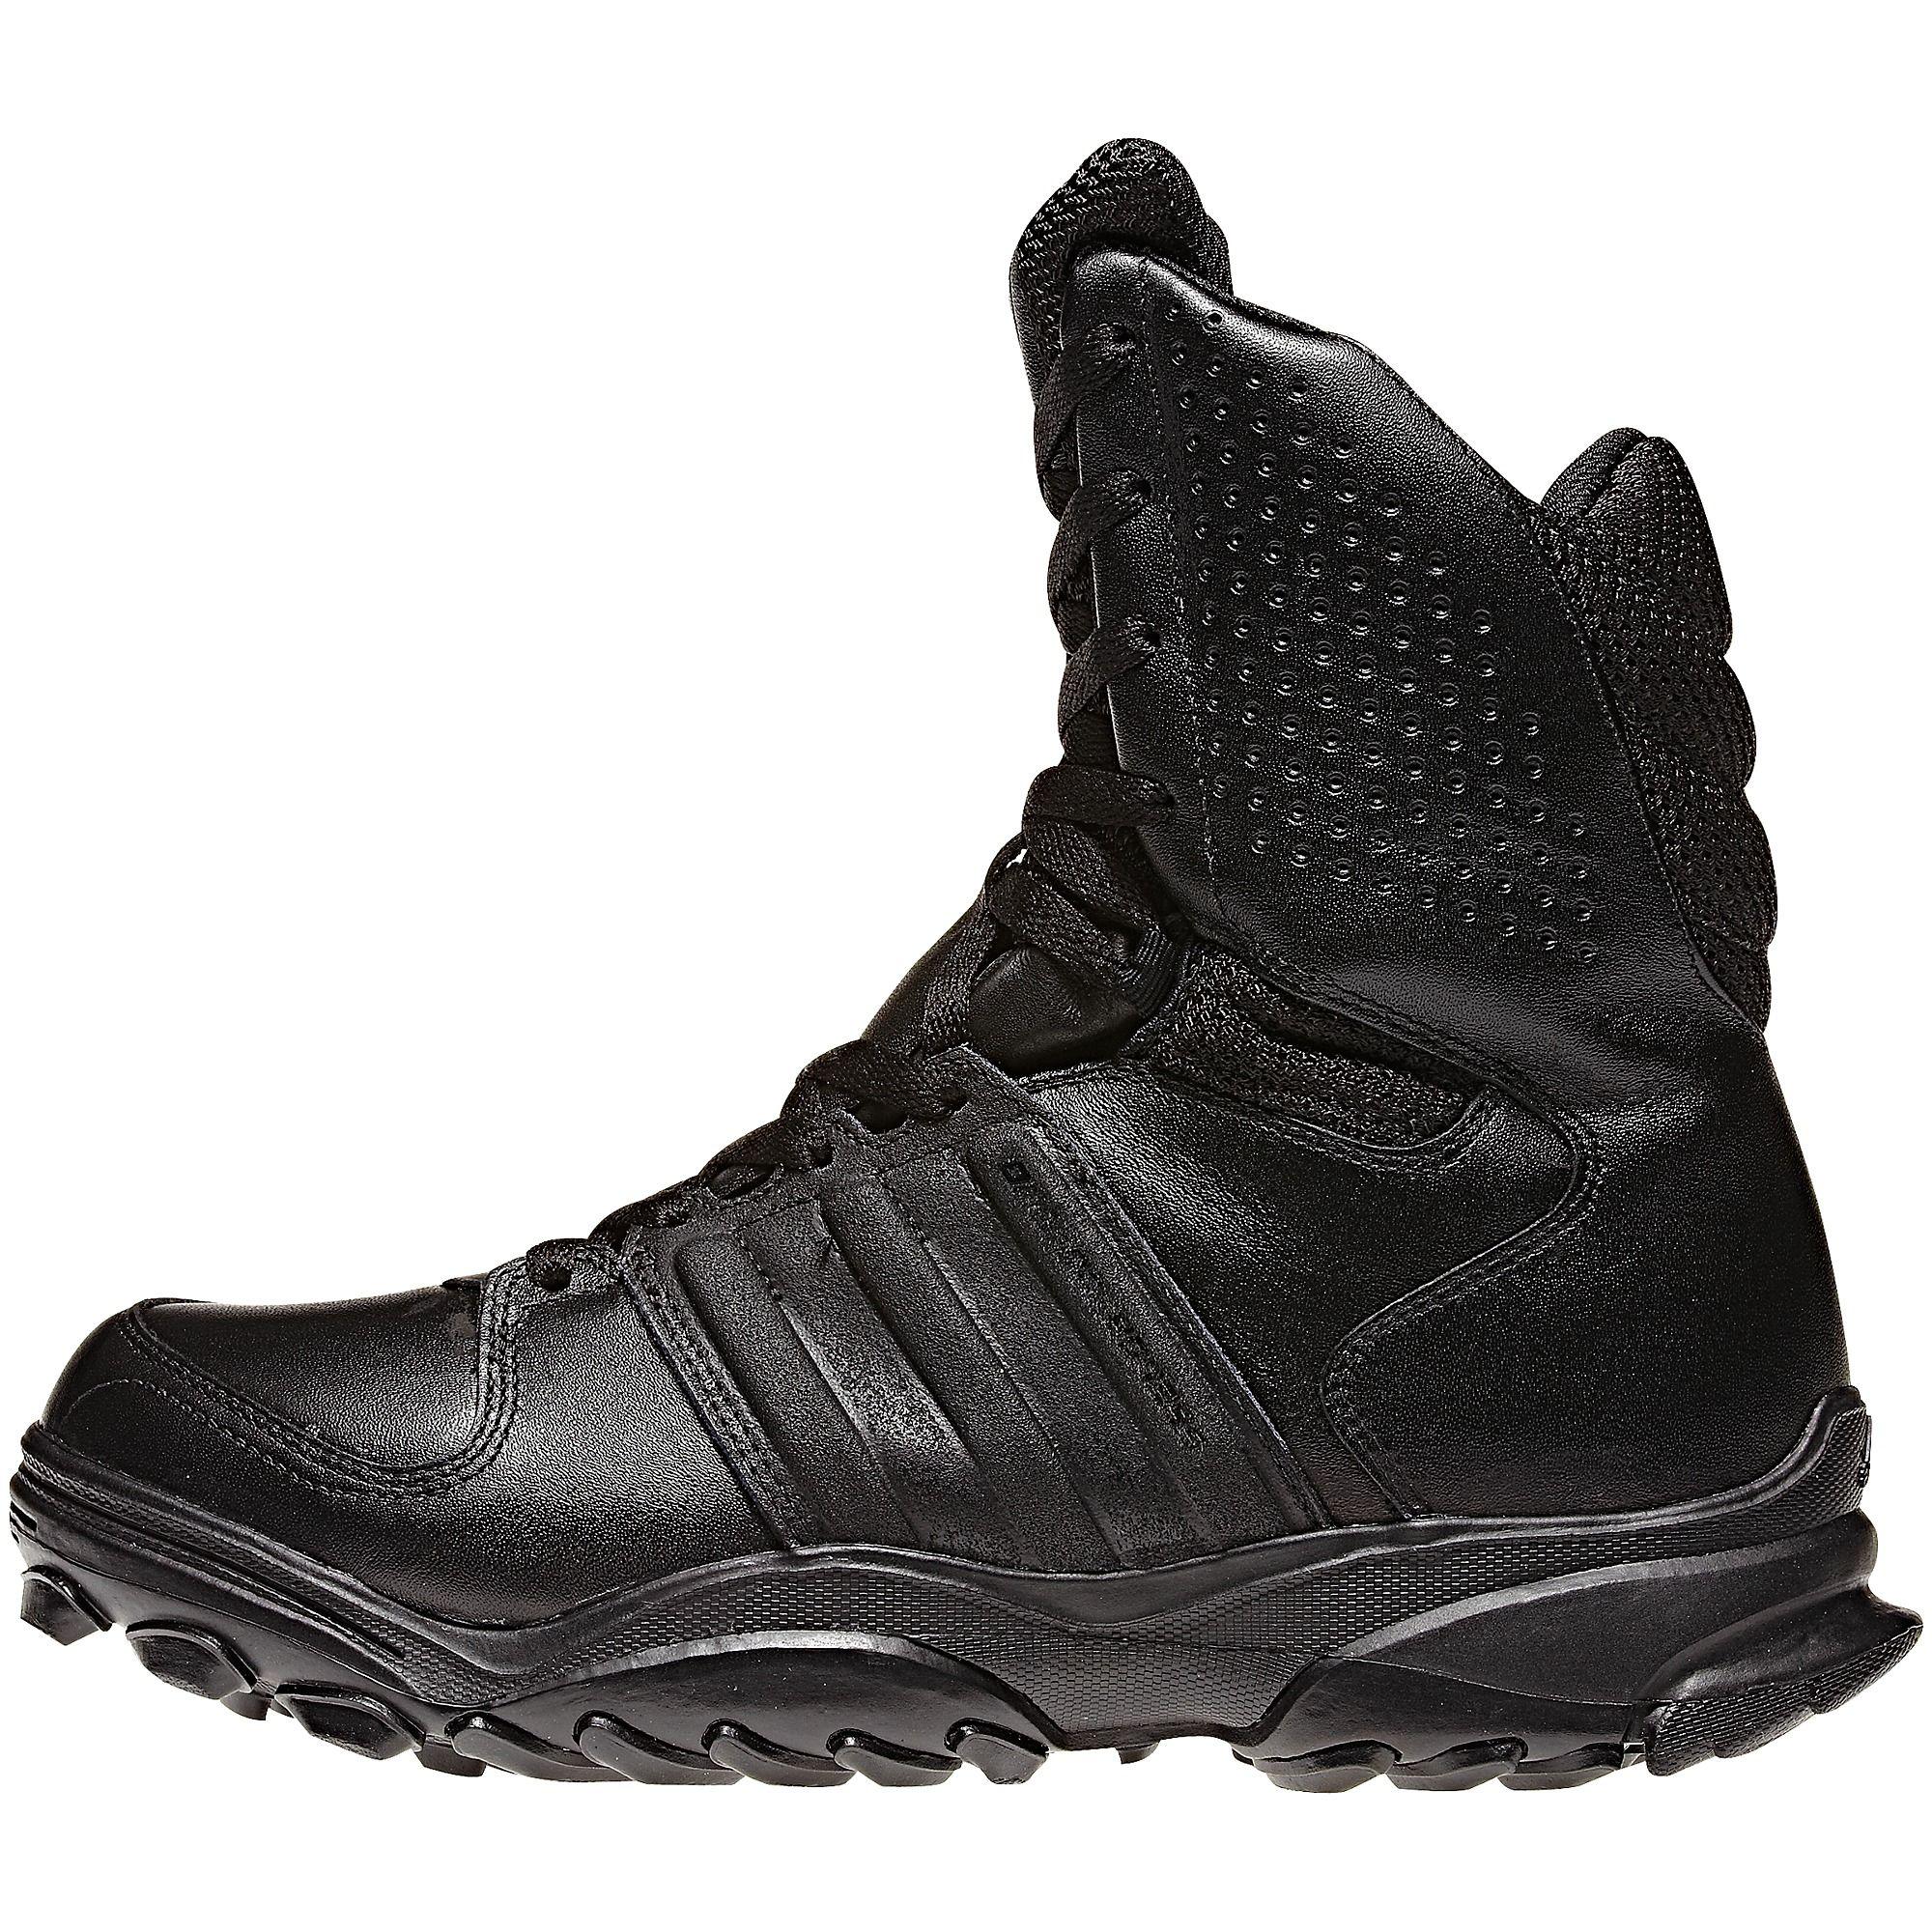 Adidas GSG 9.2 High Boots, Black